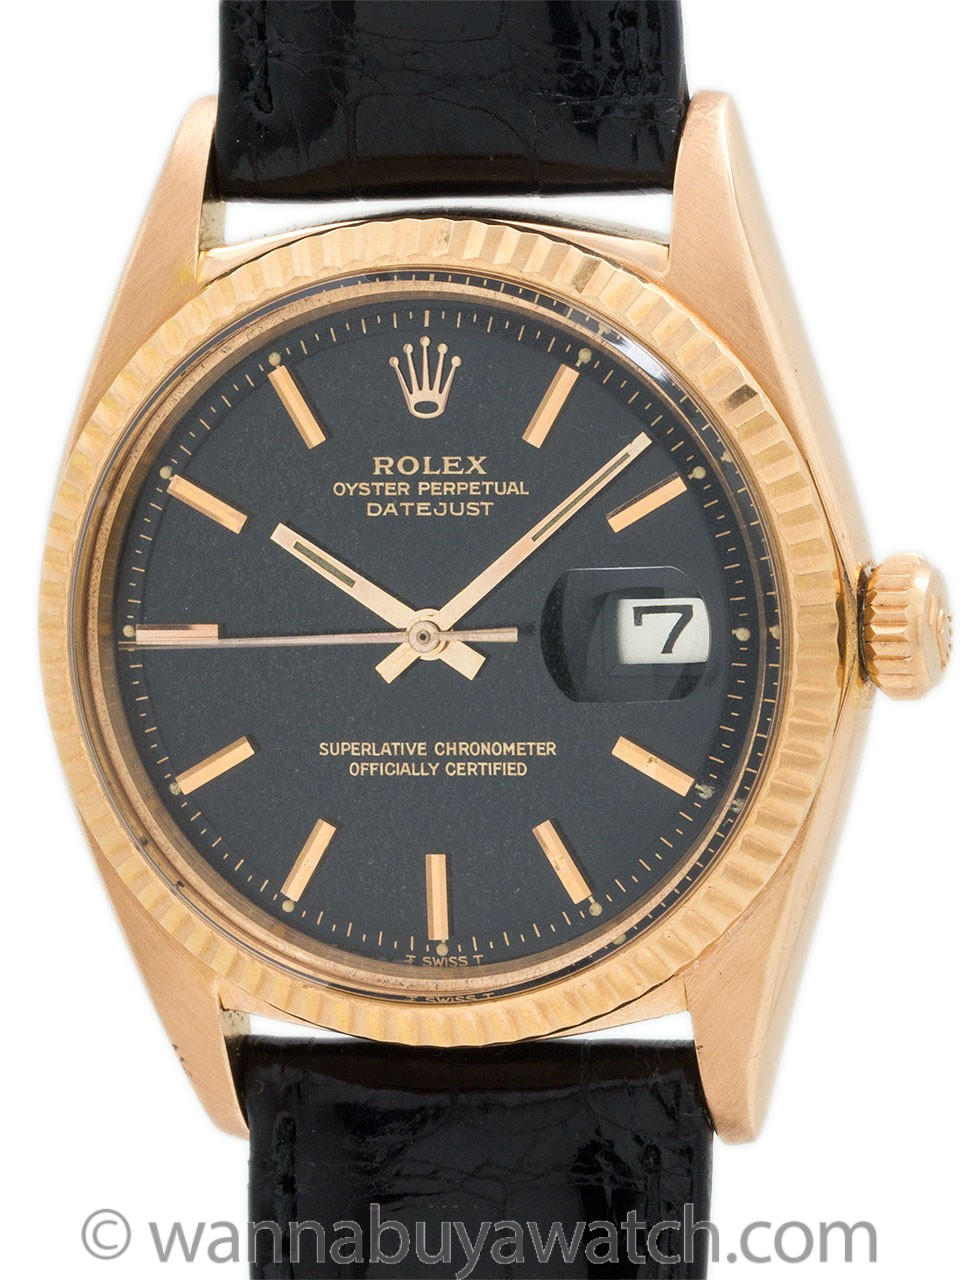 Rolex Datejust ref 1601 18K PG Black Original Dial circa 1963